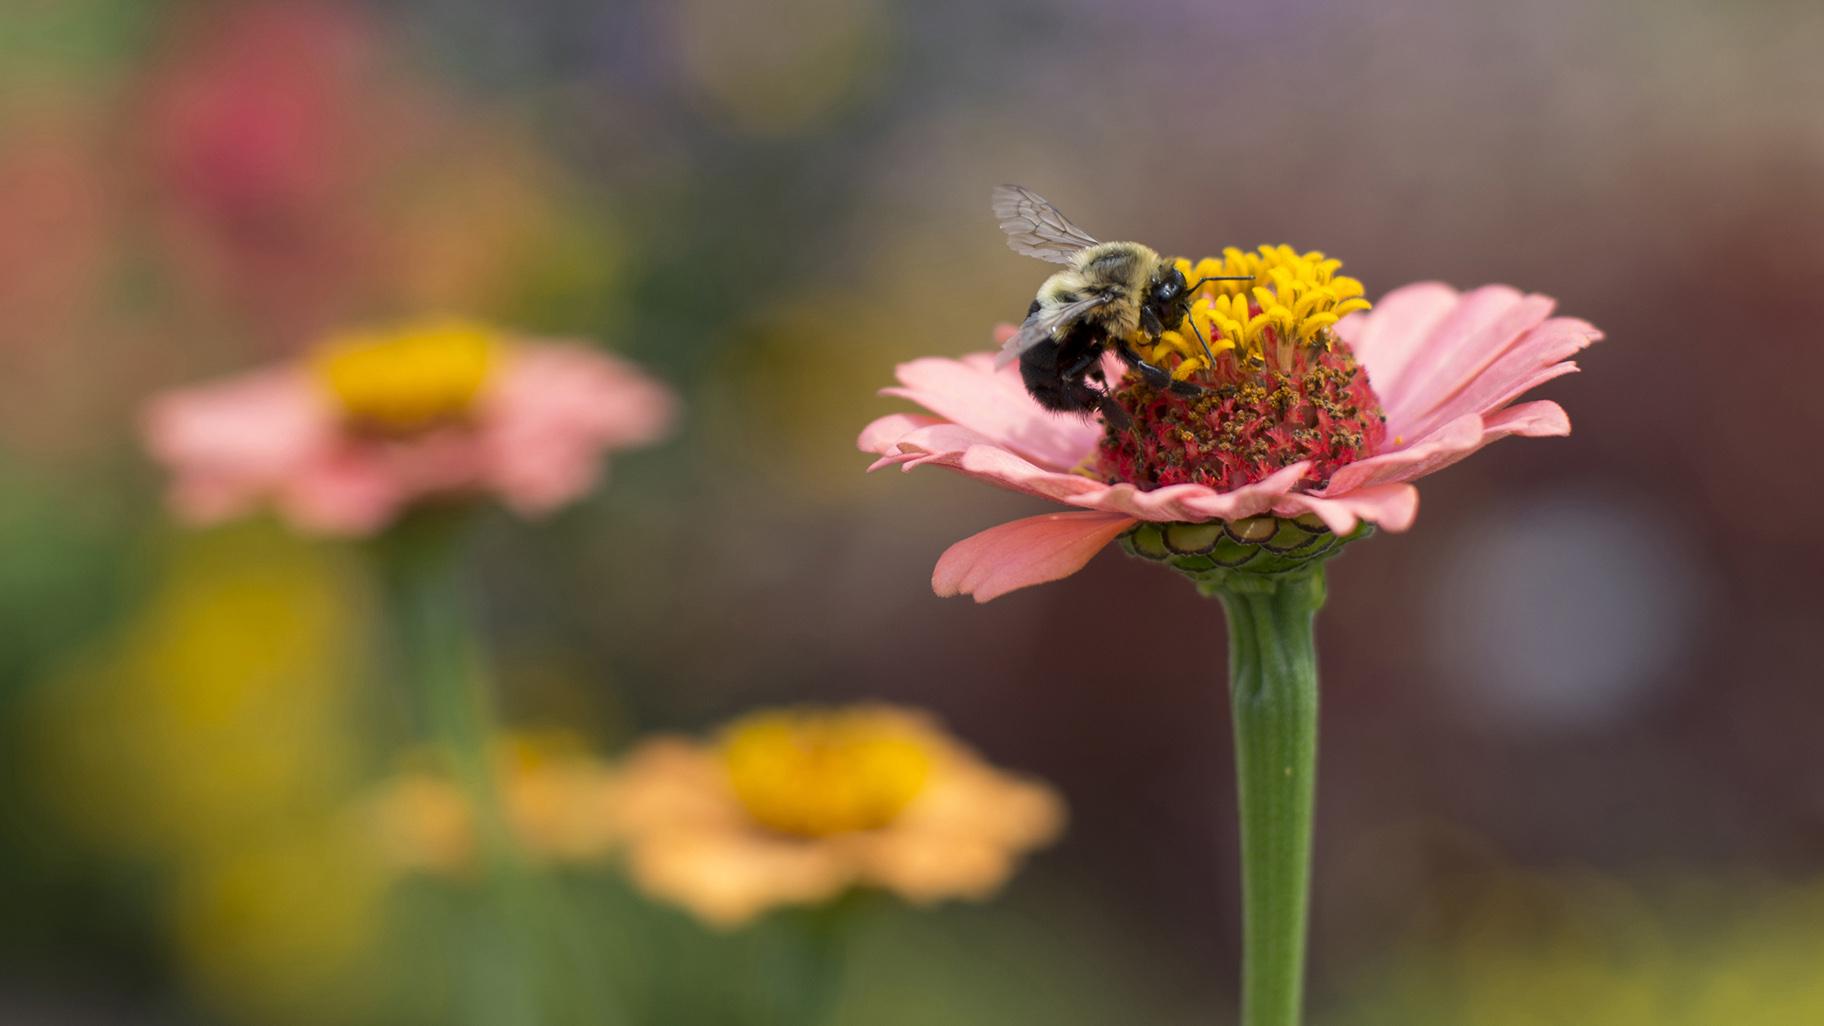 Chicago Botanic Garden Exhibit Explores the Vital Role of Pollinators